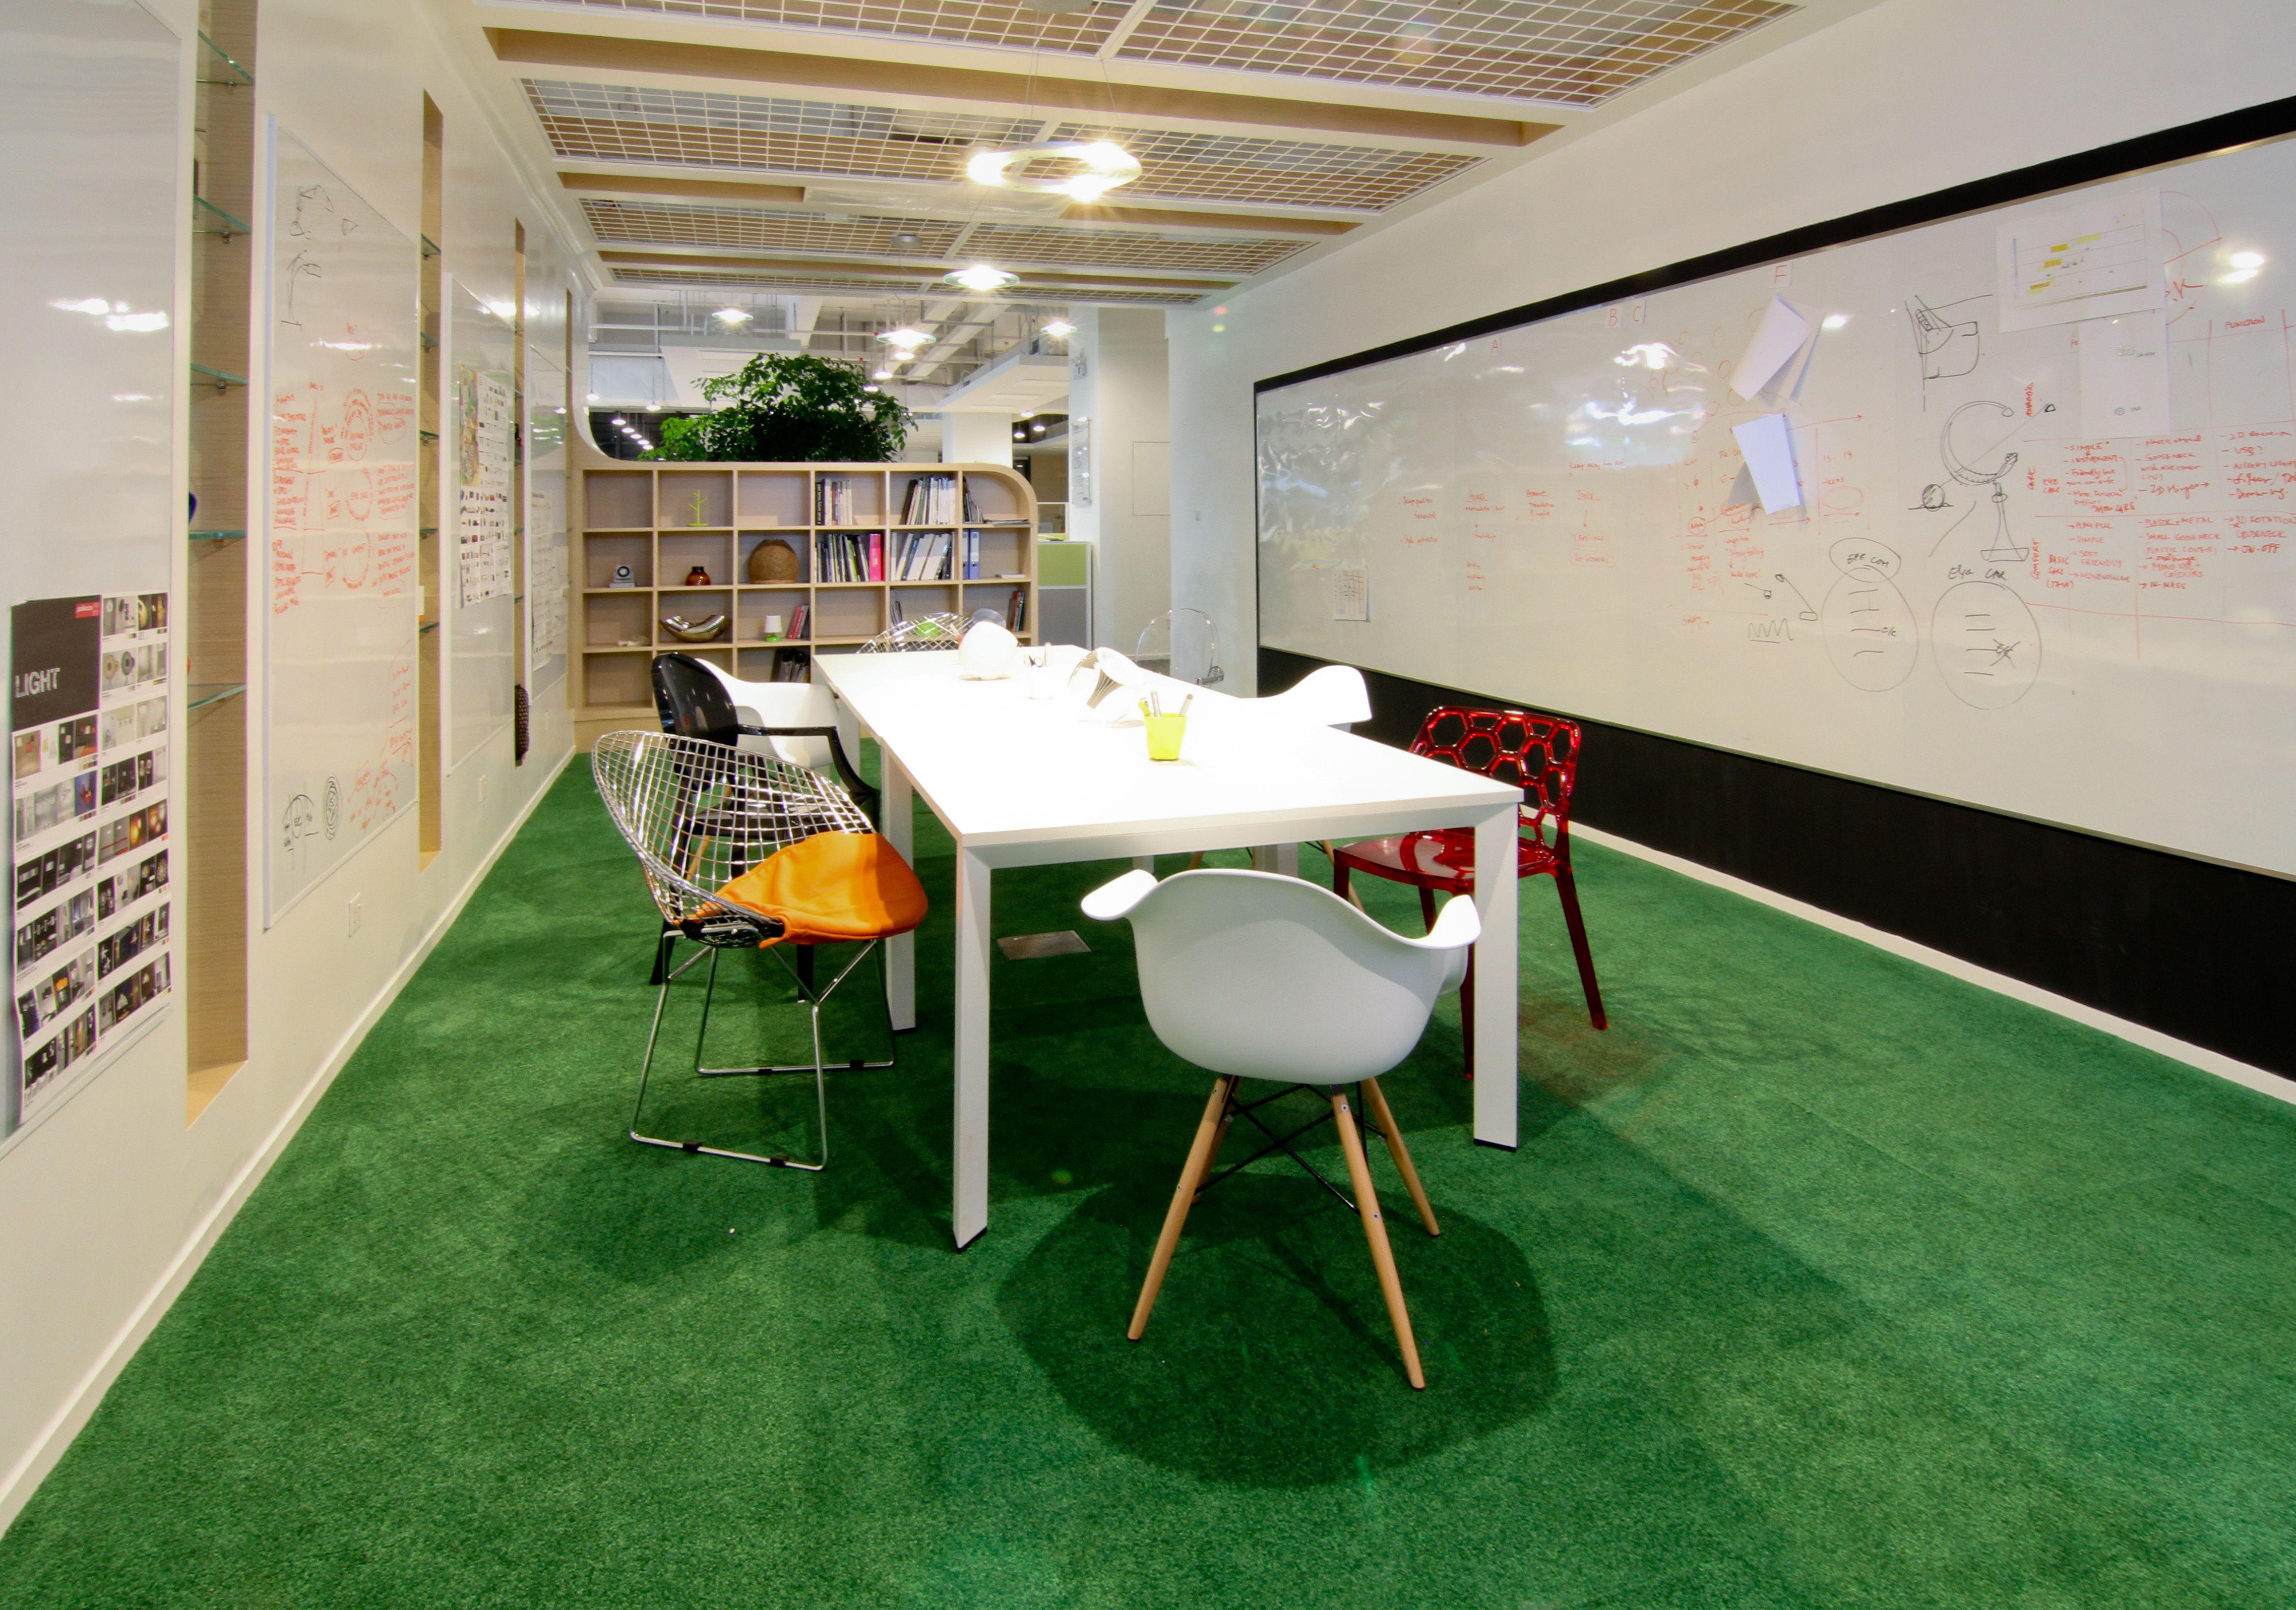 Philips Meeting Room Design Brainstorming Room Interior